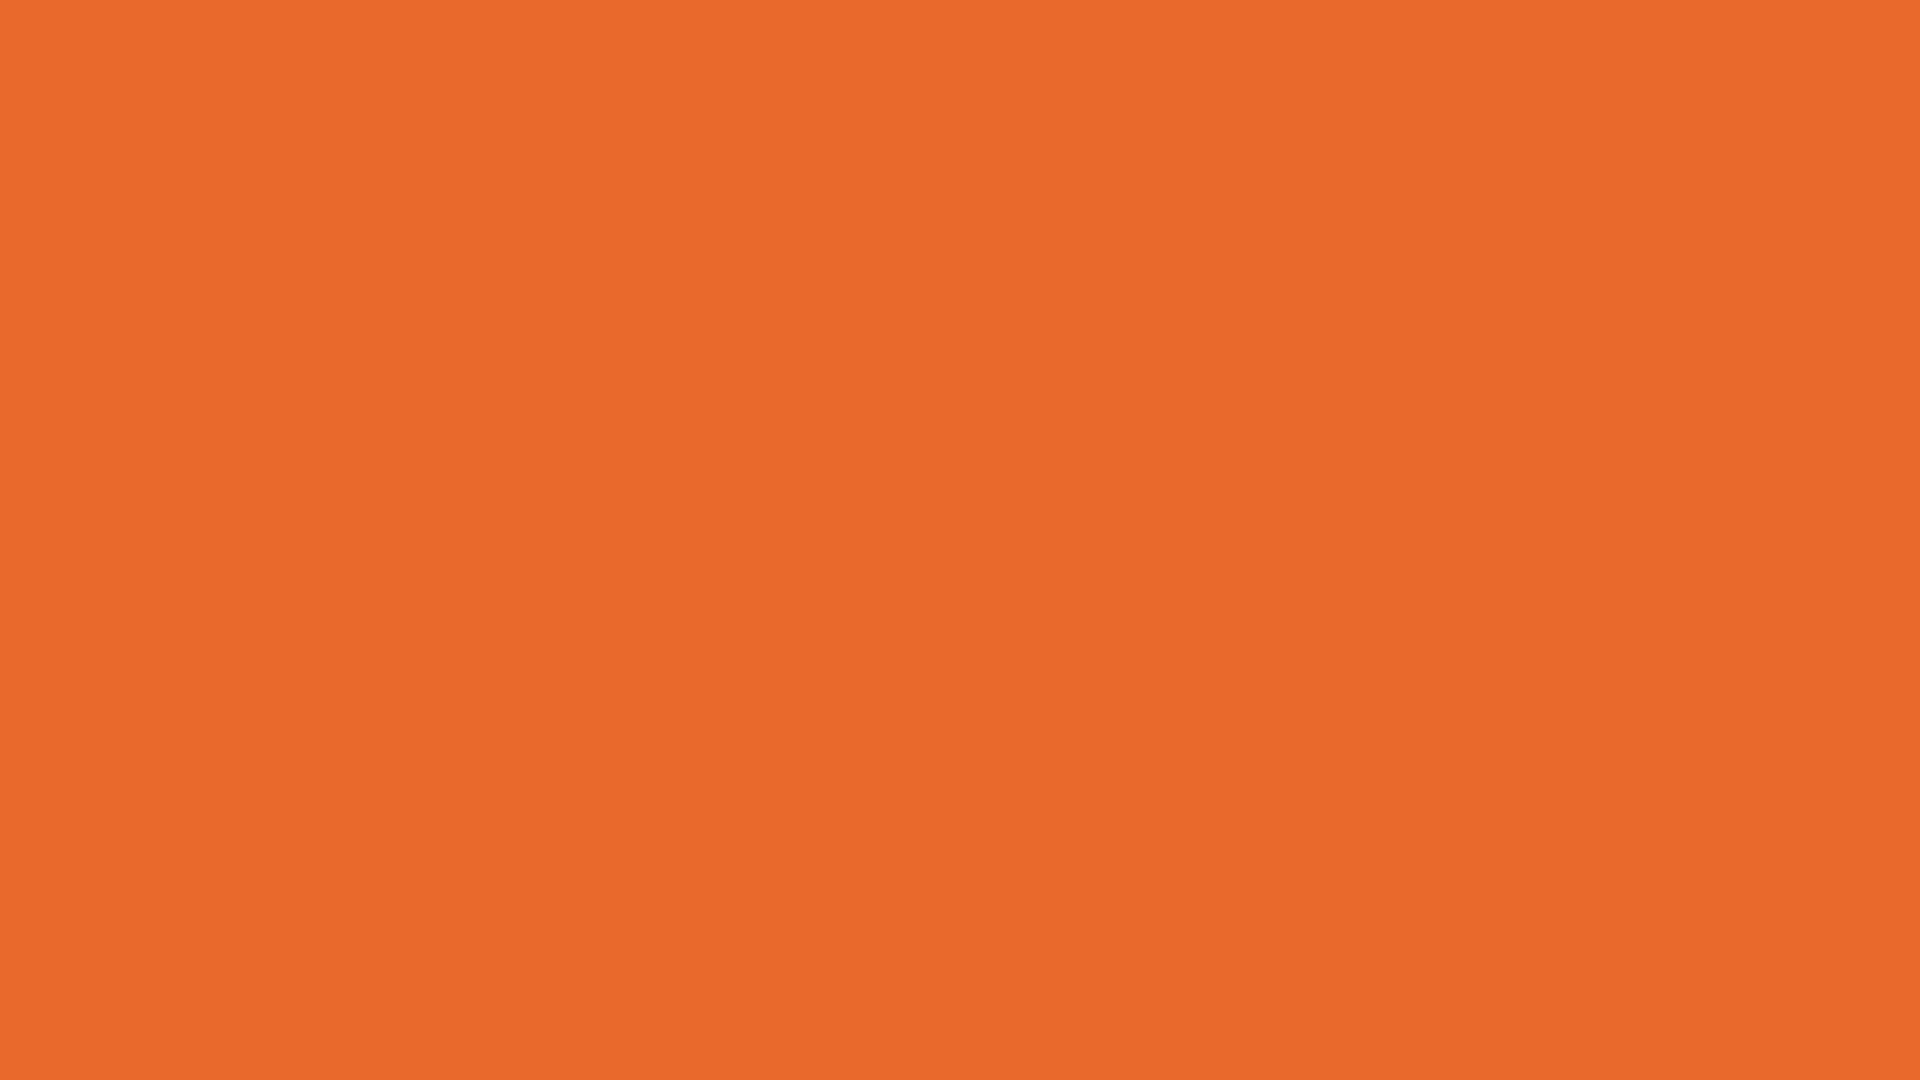 1920x1080 Deep Carrot Orange Solid Color Background